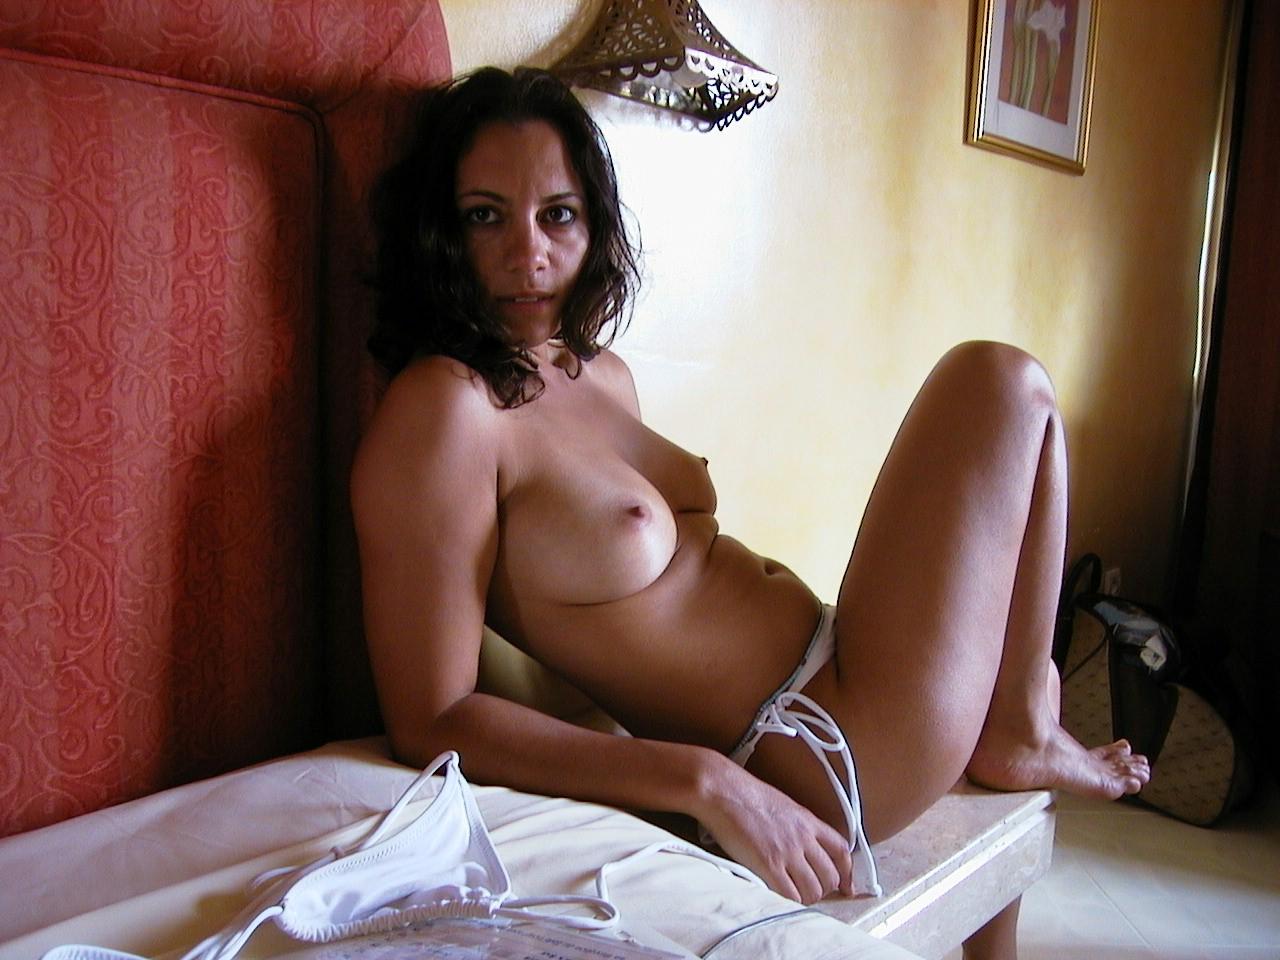 plan cul sodomie hard une femme beurette sexy du 74